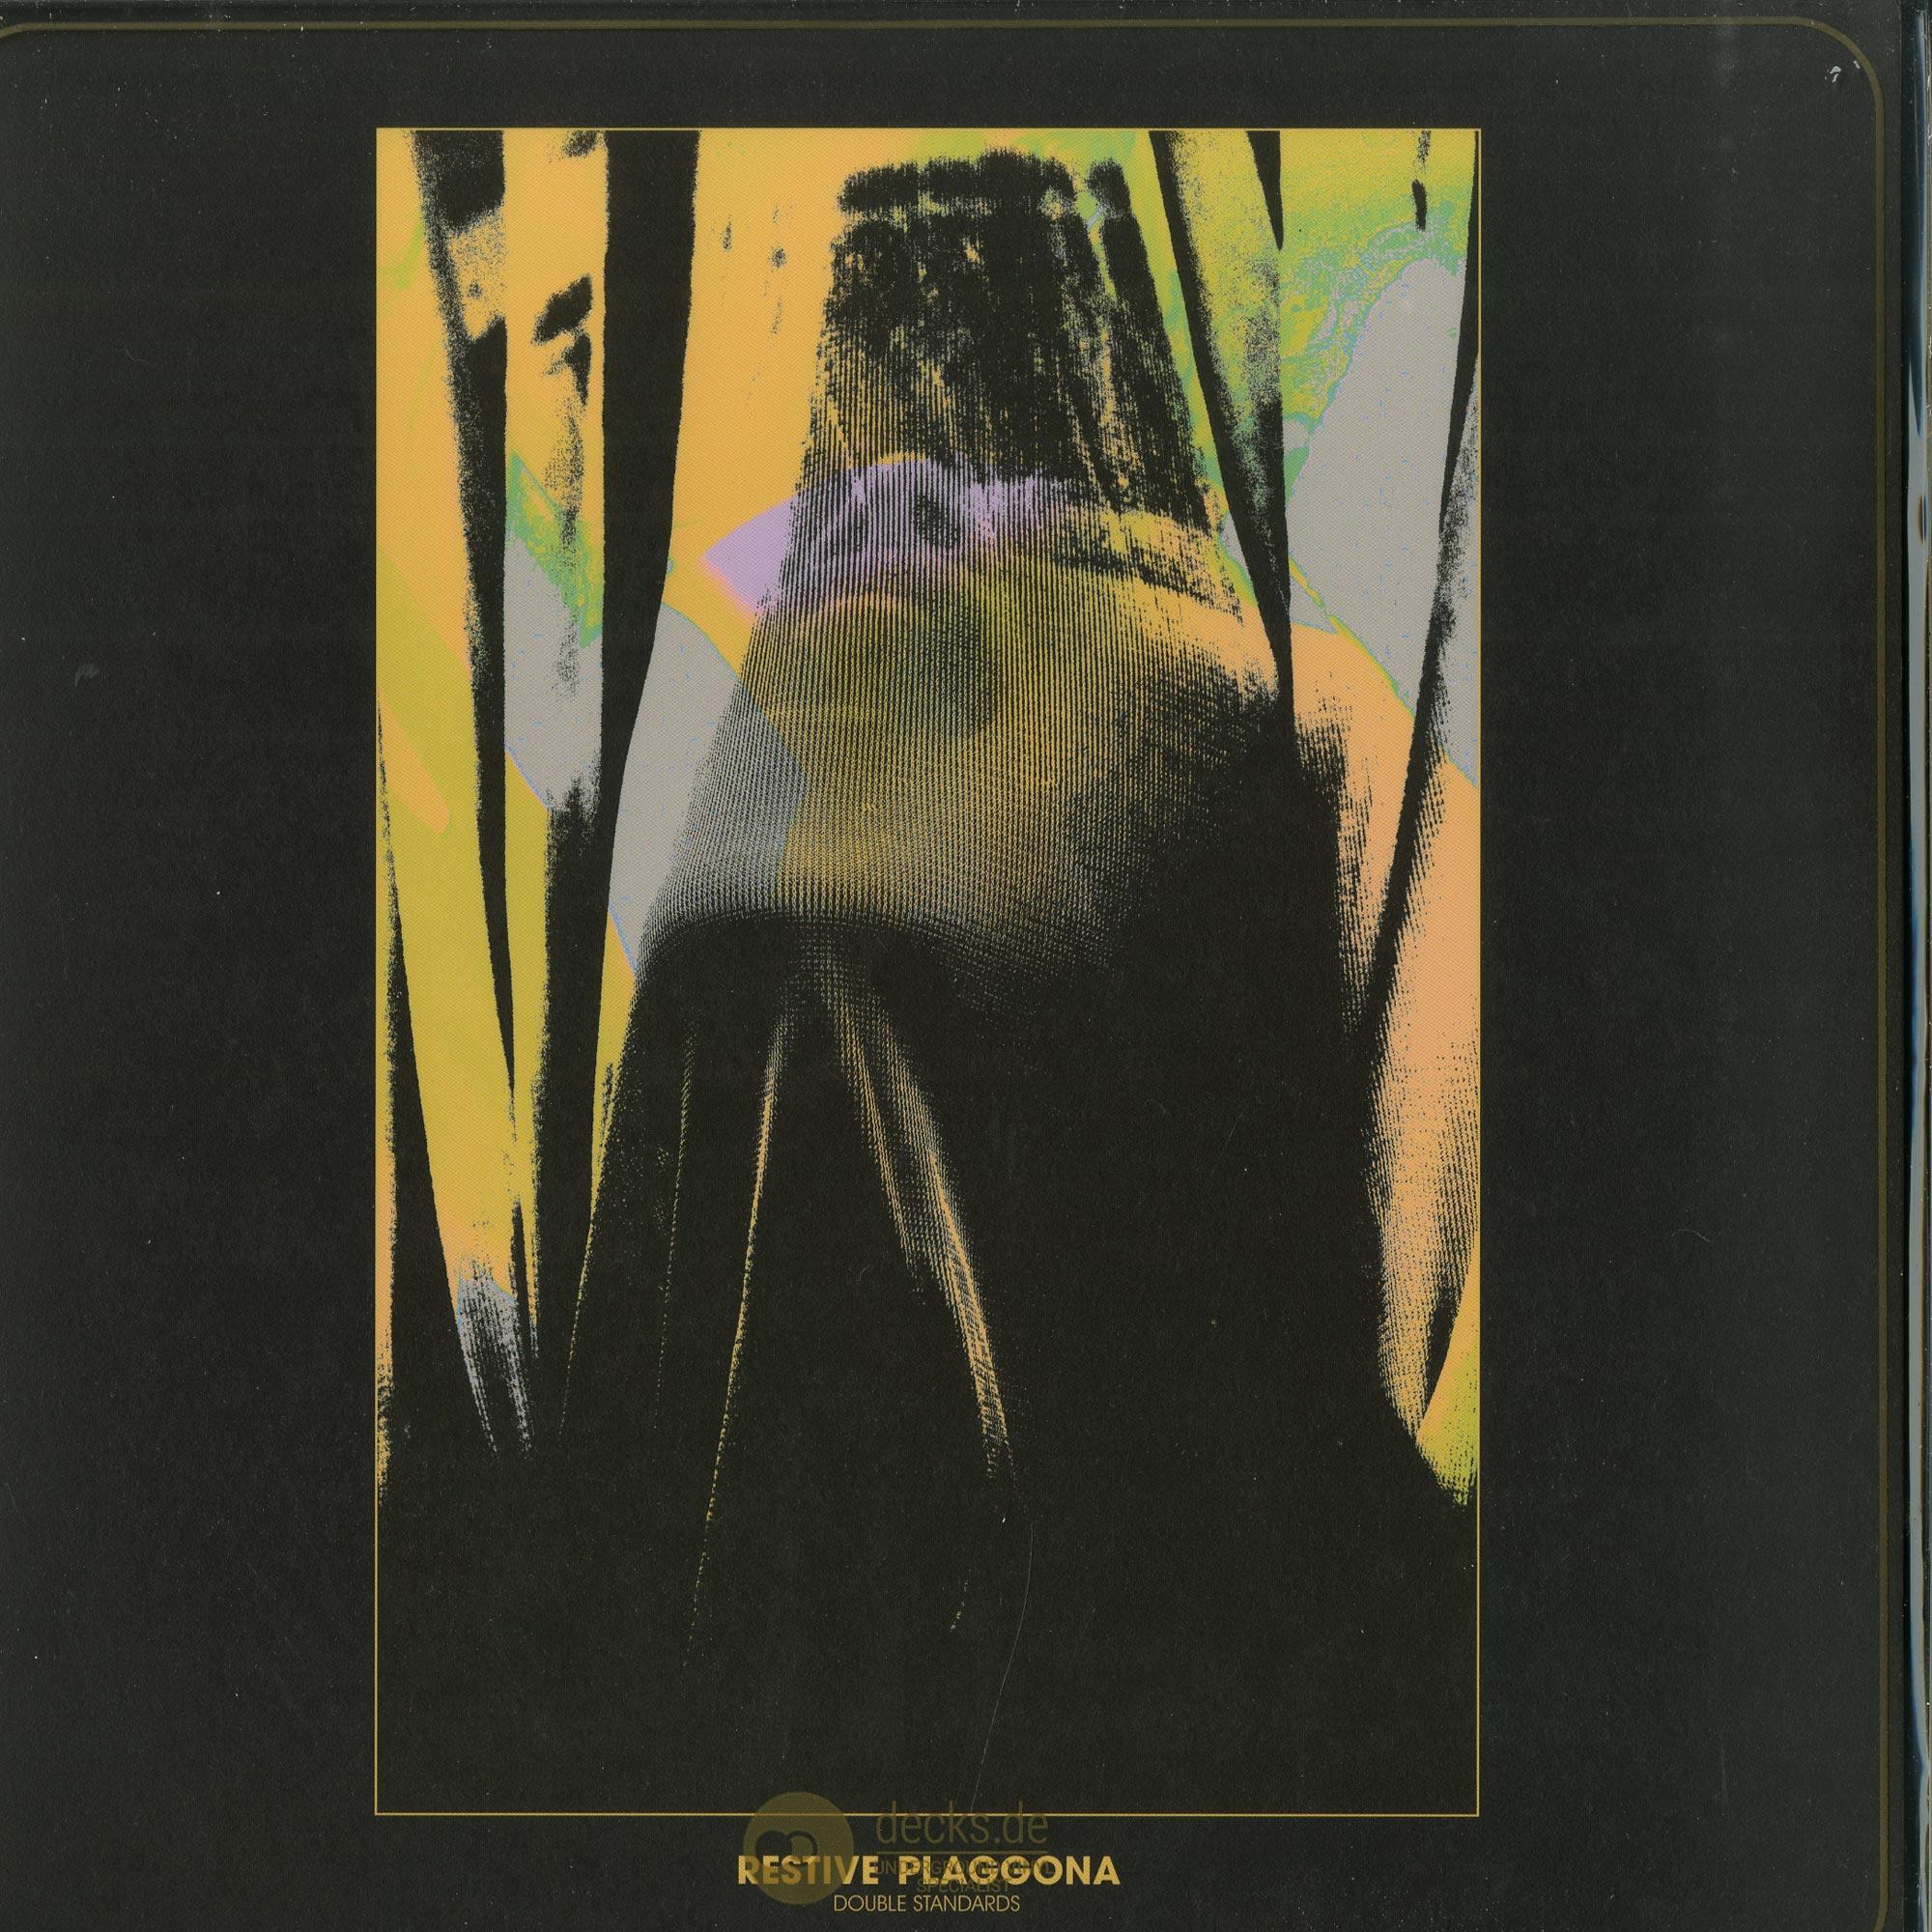 Restive Plaggona - DOUBLE STANDARDS EP